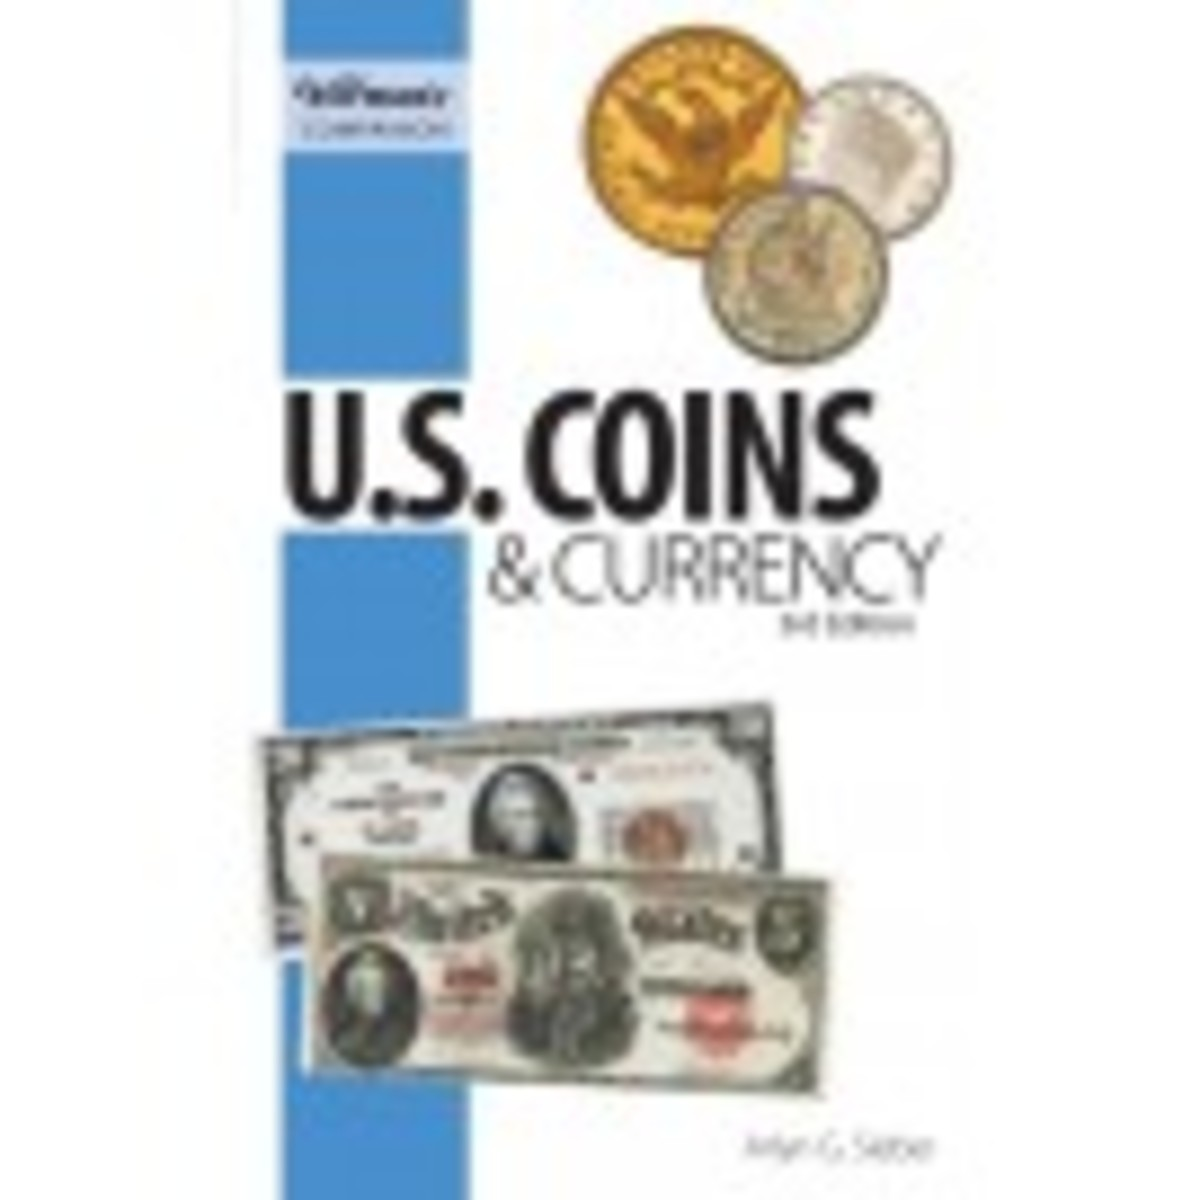 U.S. Coins & Currency Warman's Companion